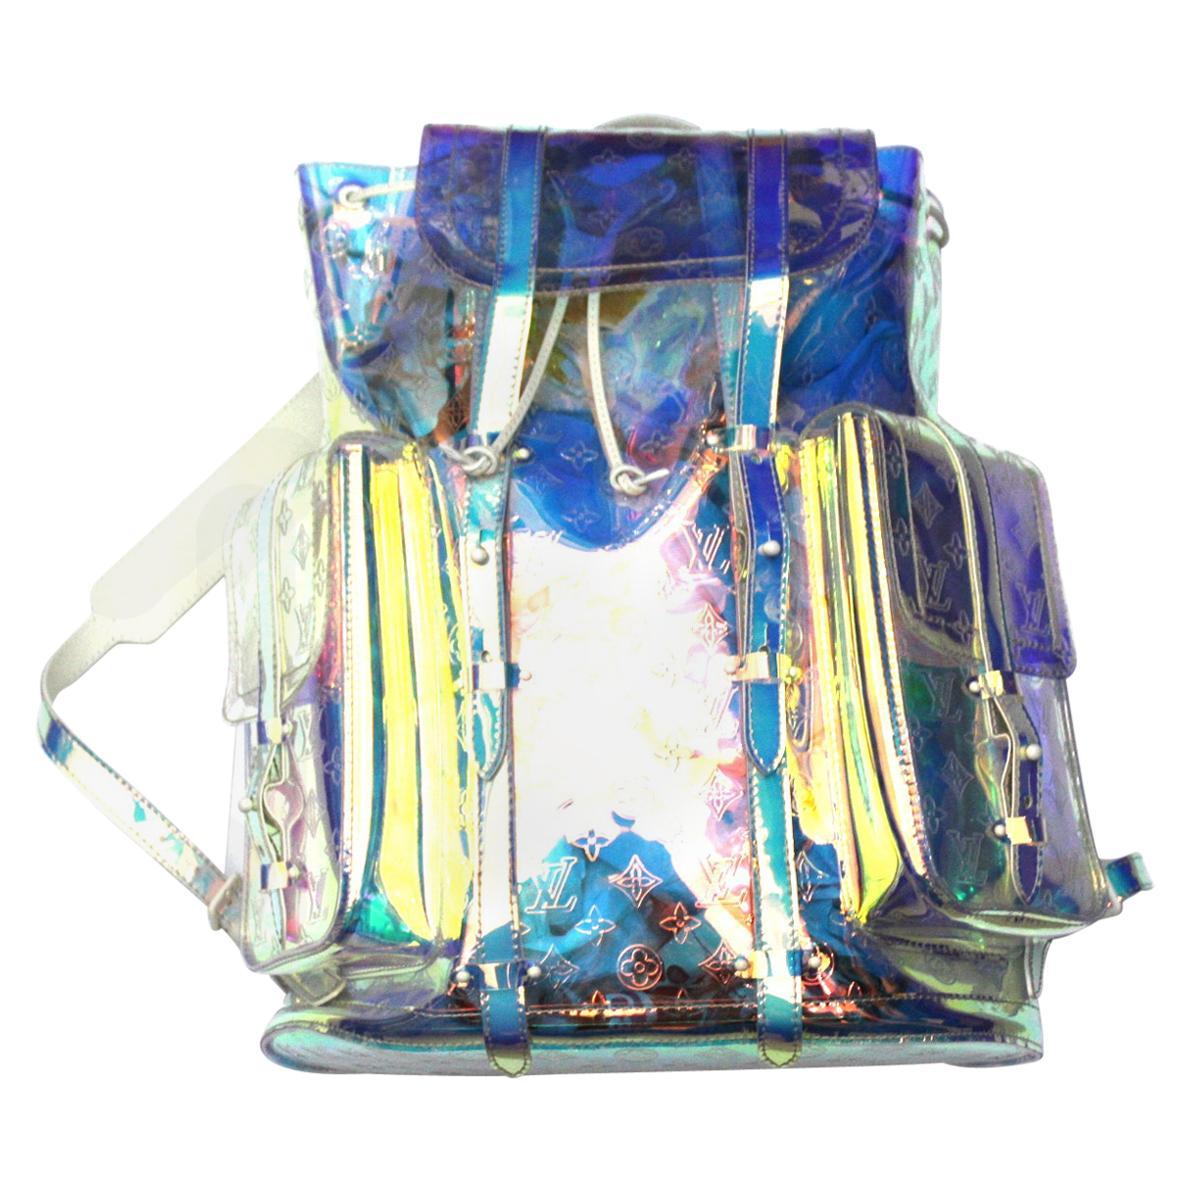 Virgil Abloh x Louis Vuitton Prism Christopher GM Backpack Bag